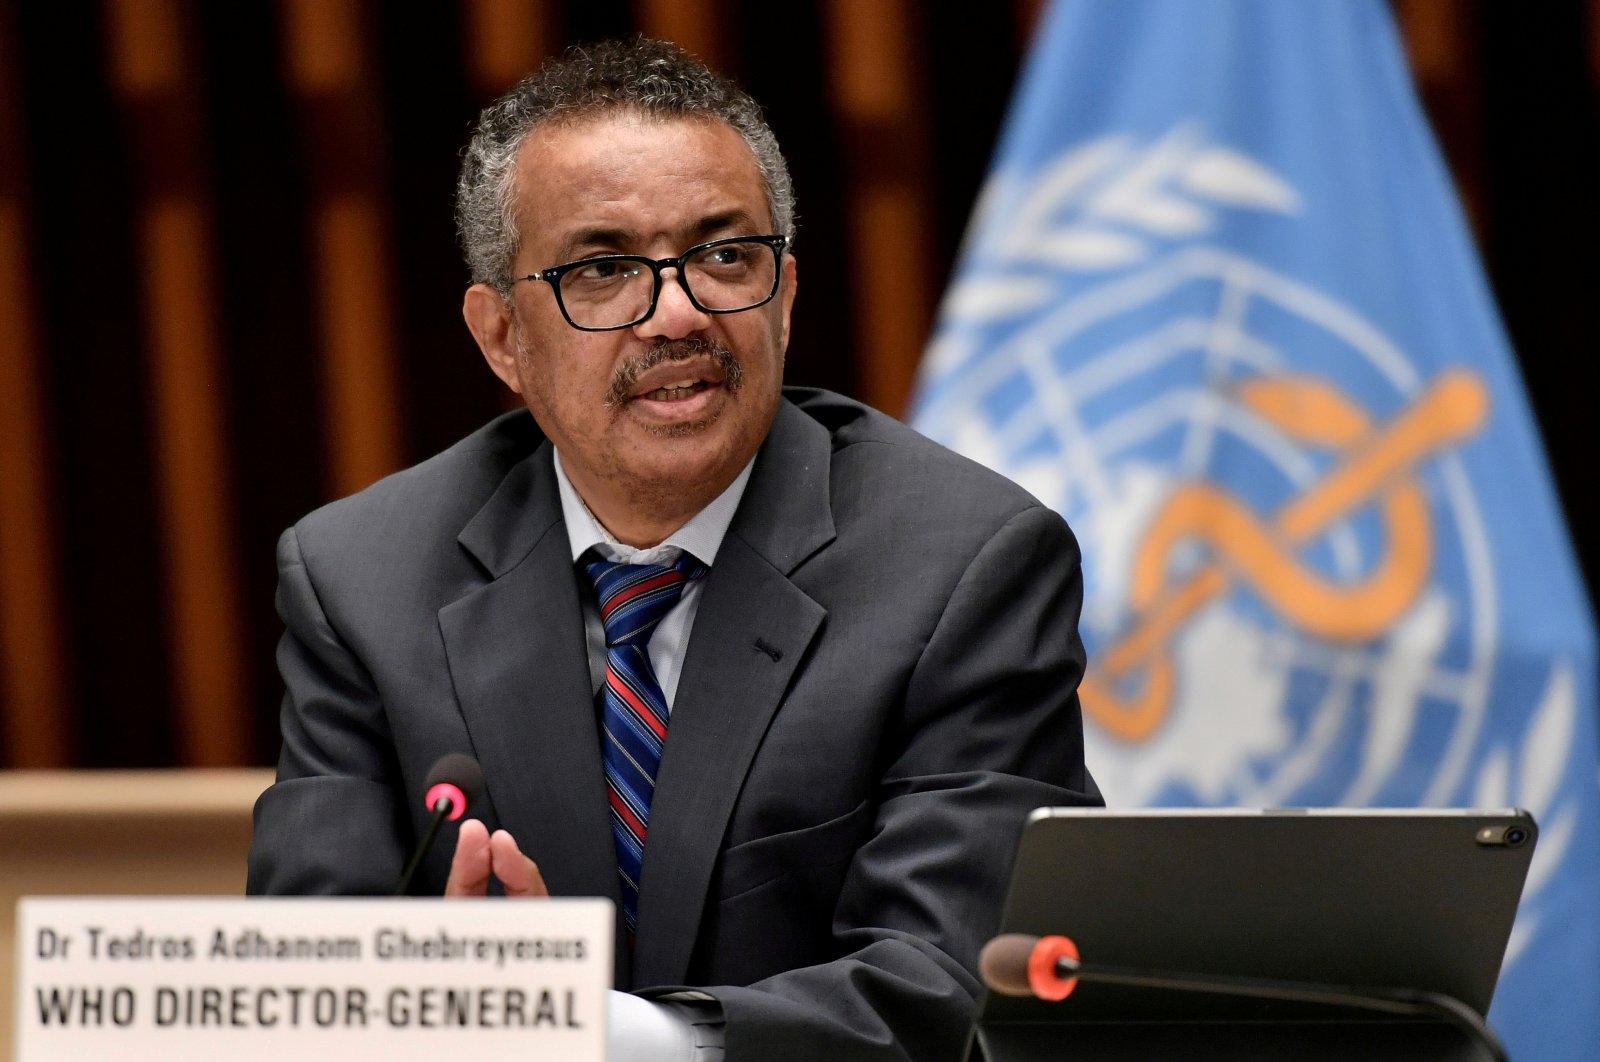 World Health Organization (WHO) Director-General Tedros Adhanom Ghebreyesus attends a news conference in Geneva, Switzerland, July 3, 2020. (Reuters Photo)